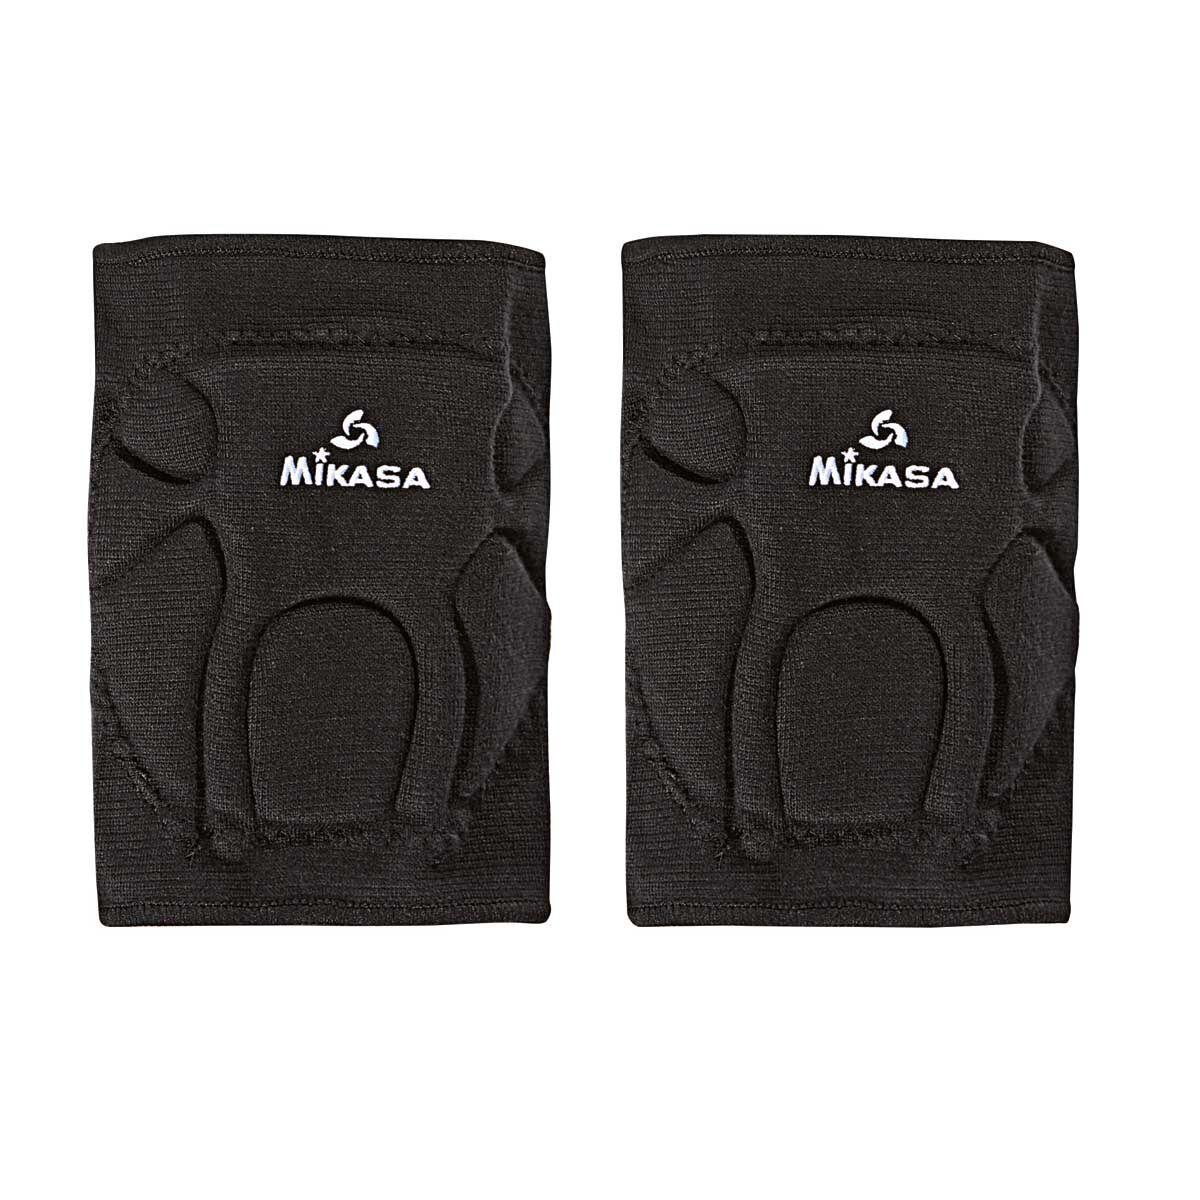 mizuno volleyball knee pads size chart australia